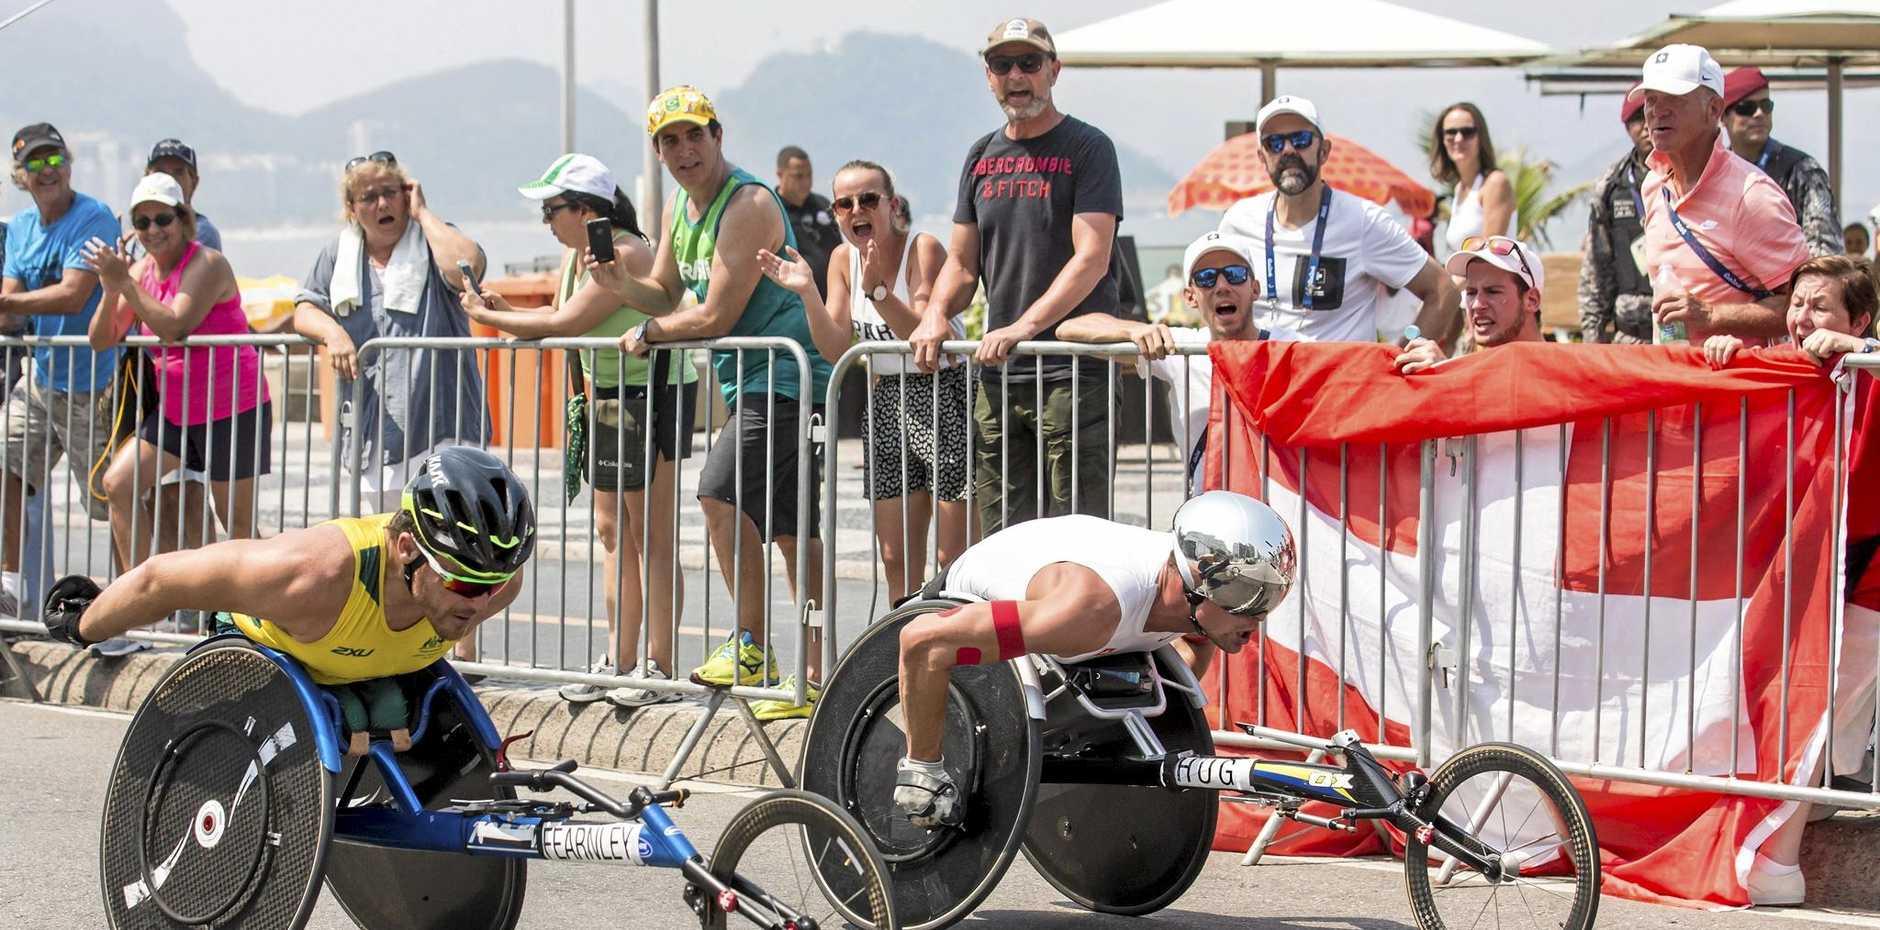 Australia's Kurt Fearnley (left) and Switzerland's Marcel Hug compete in the marathon T54 race.